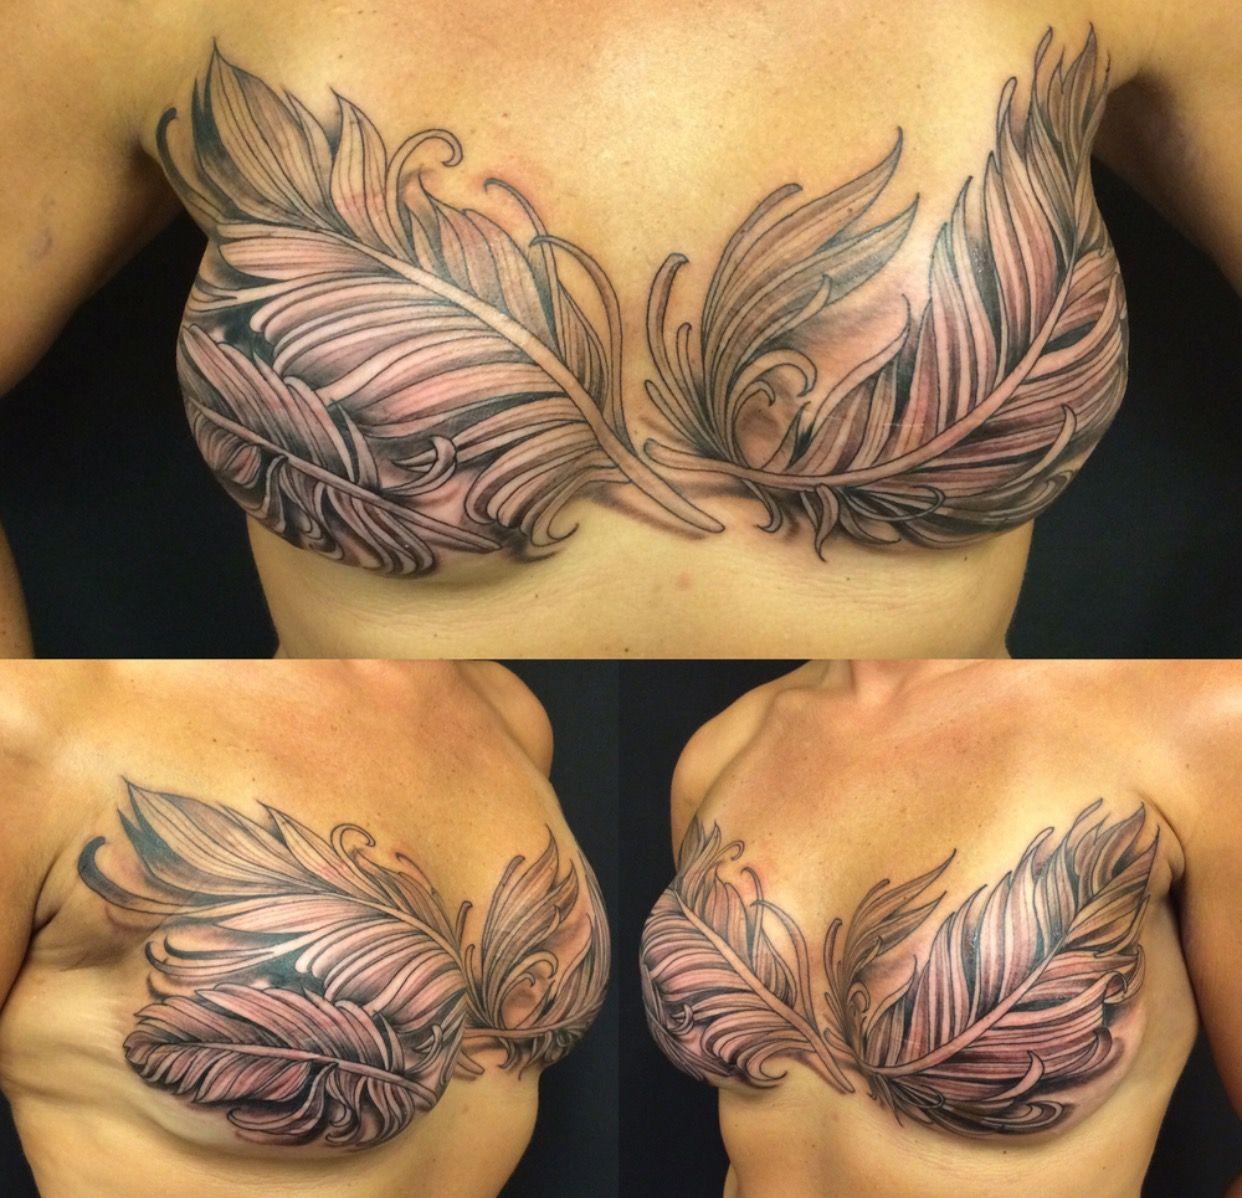 Pin by lutz gruno on mastectomy tattoo mastectomy tattoo